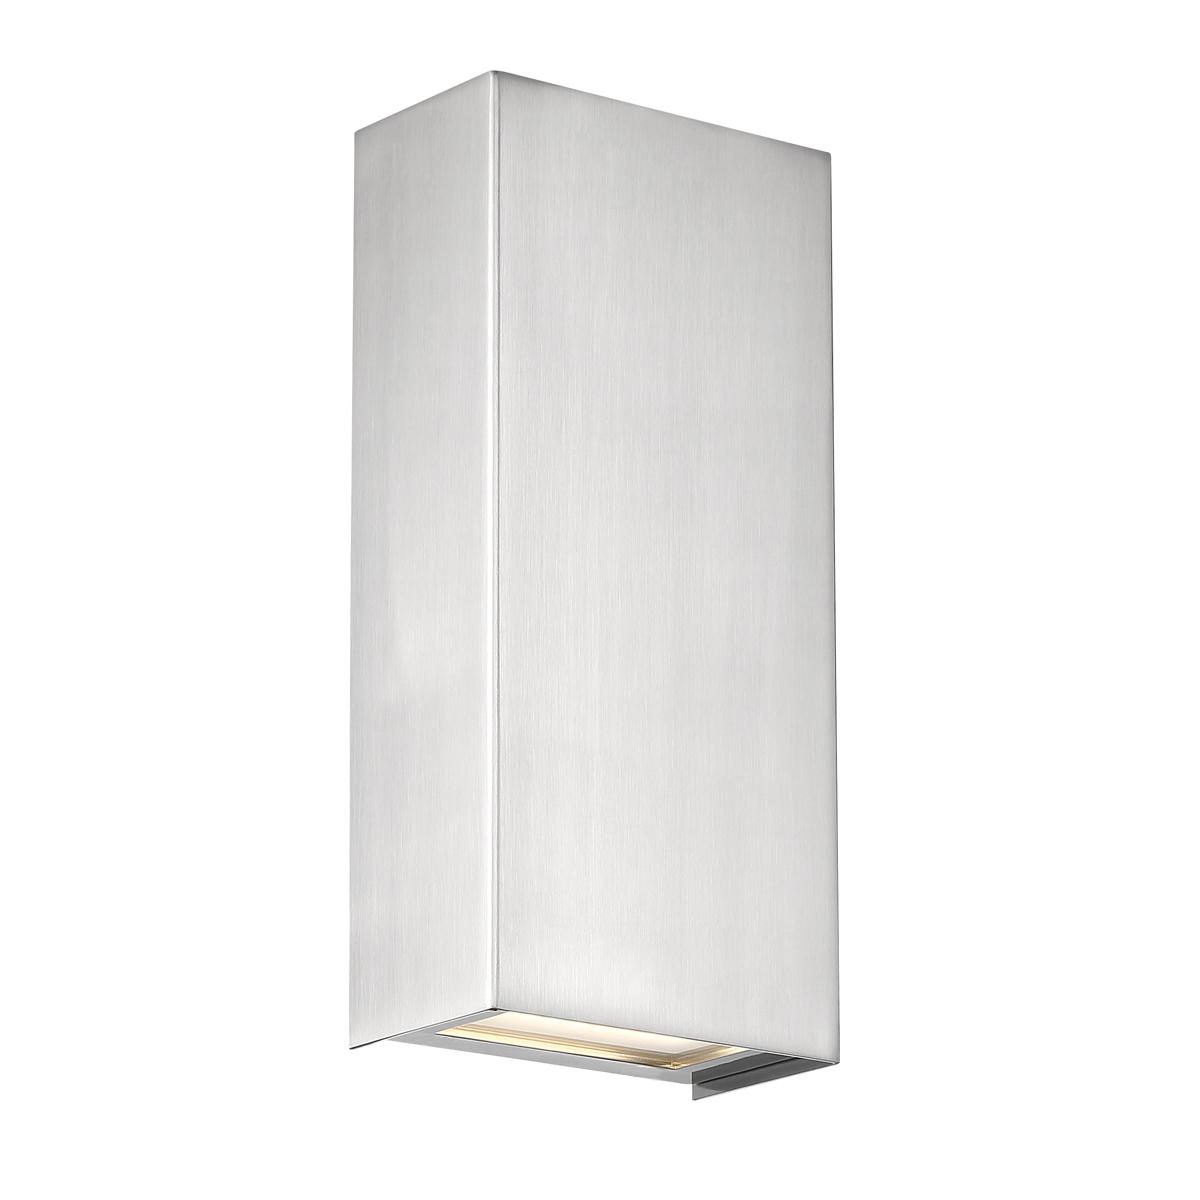 Blok Led Light Fixture For Sale Wac